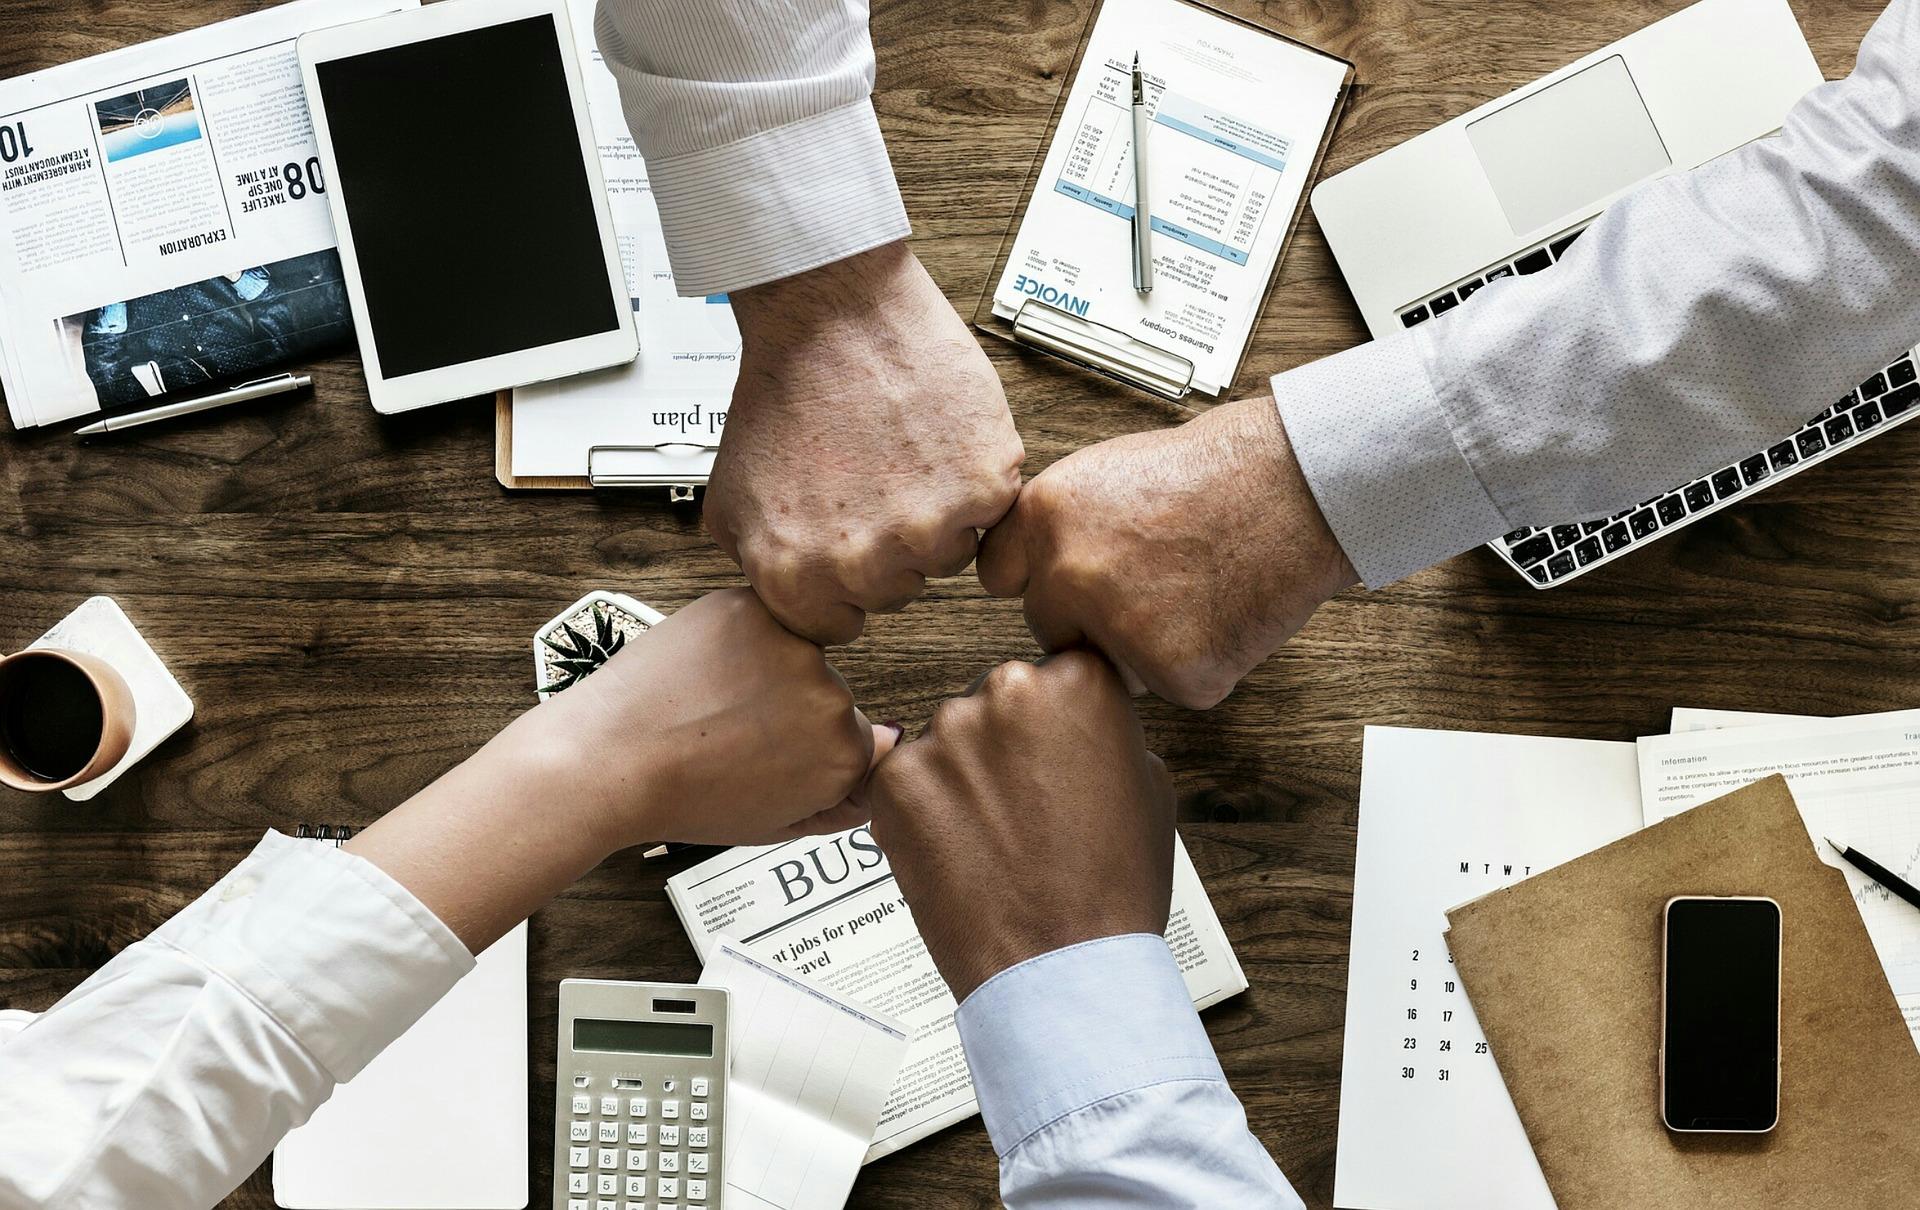 Arbeiten in Gruppen